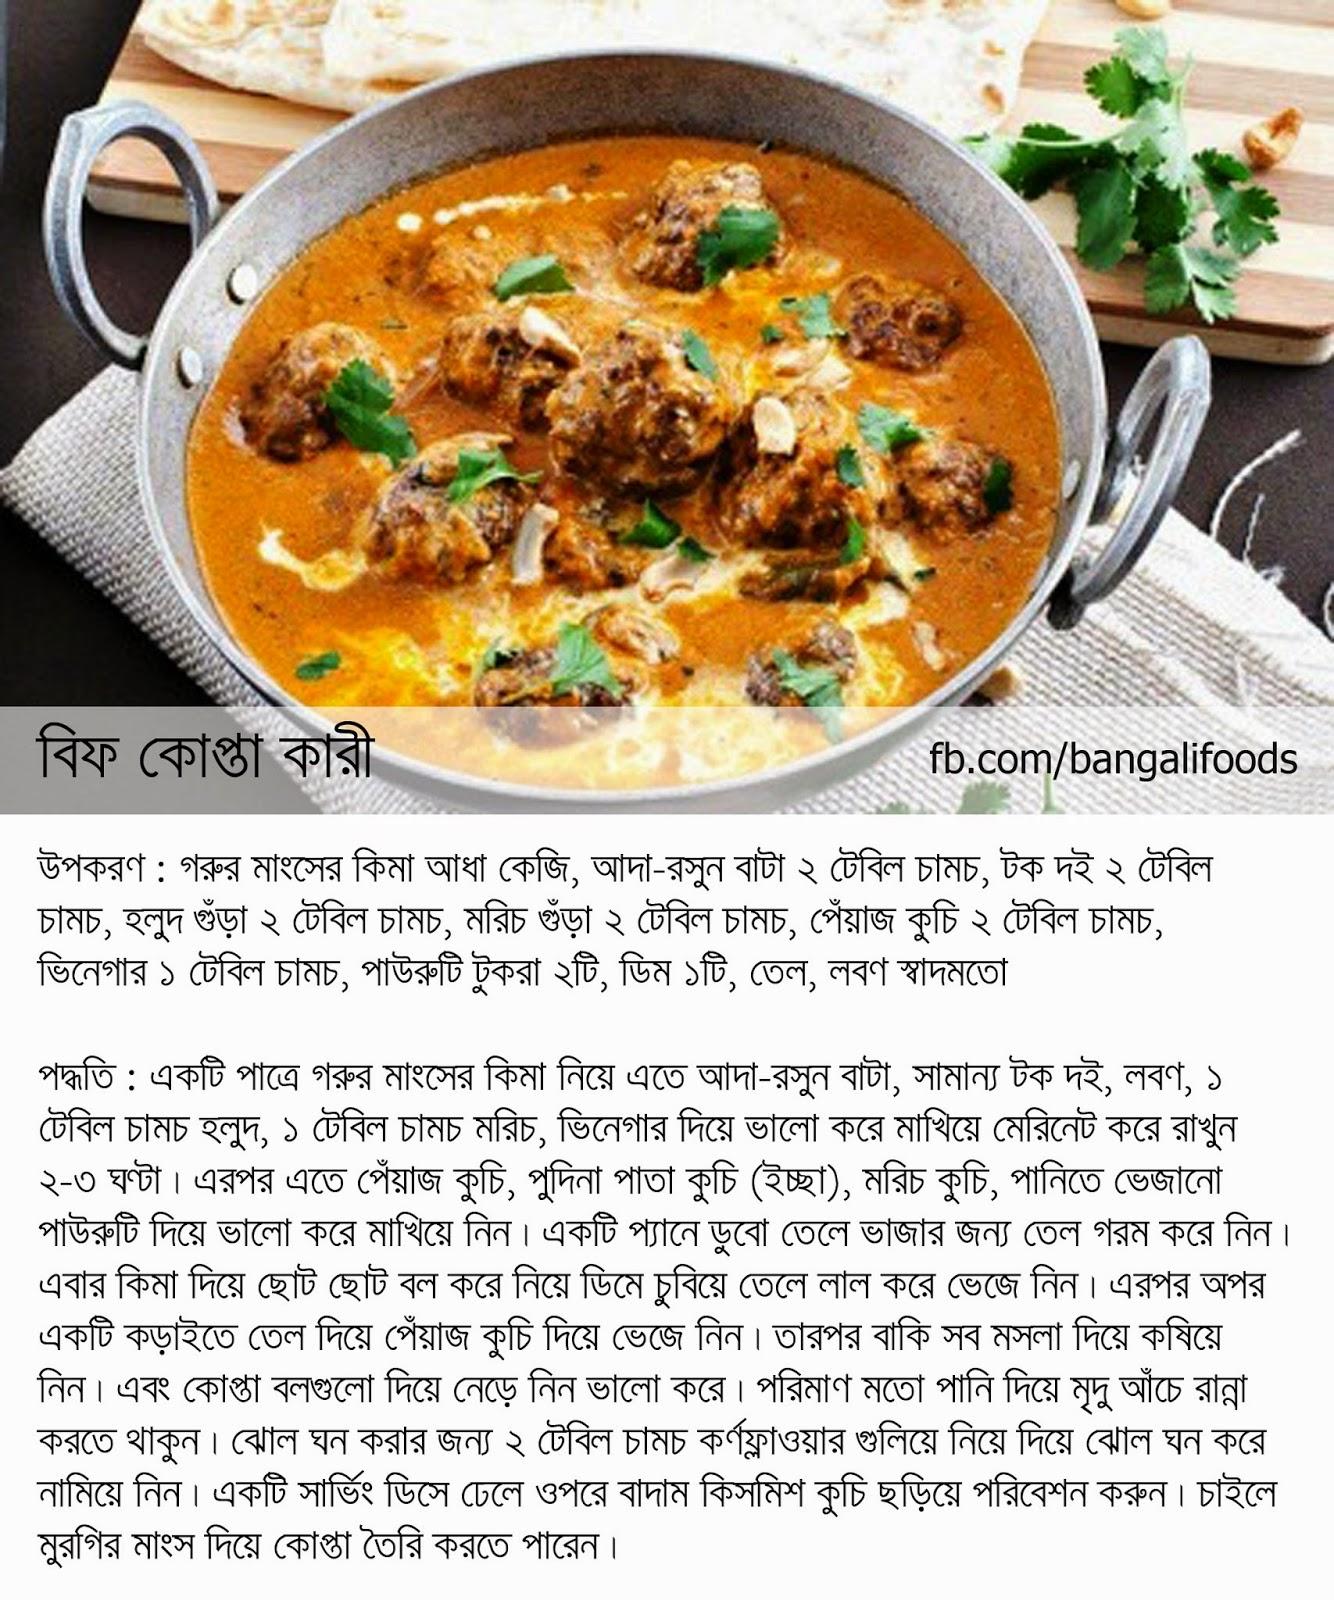 Bangali foods bengali beef recipe in bengali bengali beef recipe in bengali forumfinder Gallery